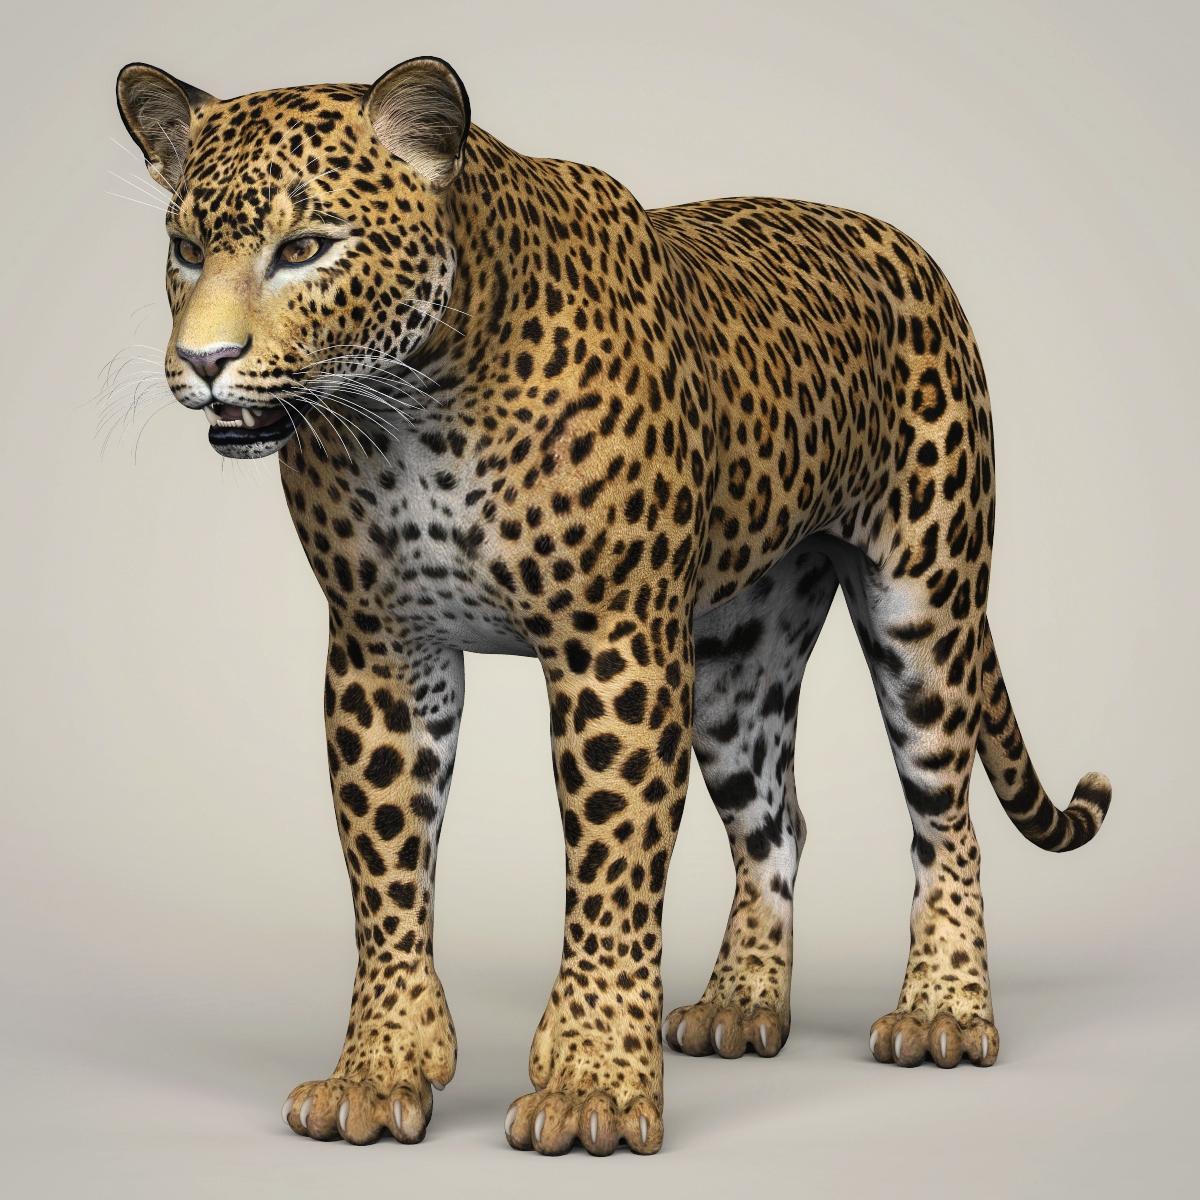 Photorealistic Wild Leopard 3D Model